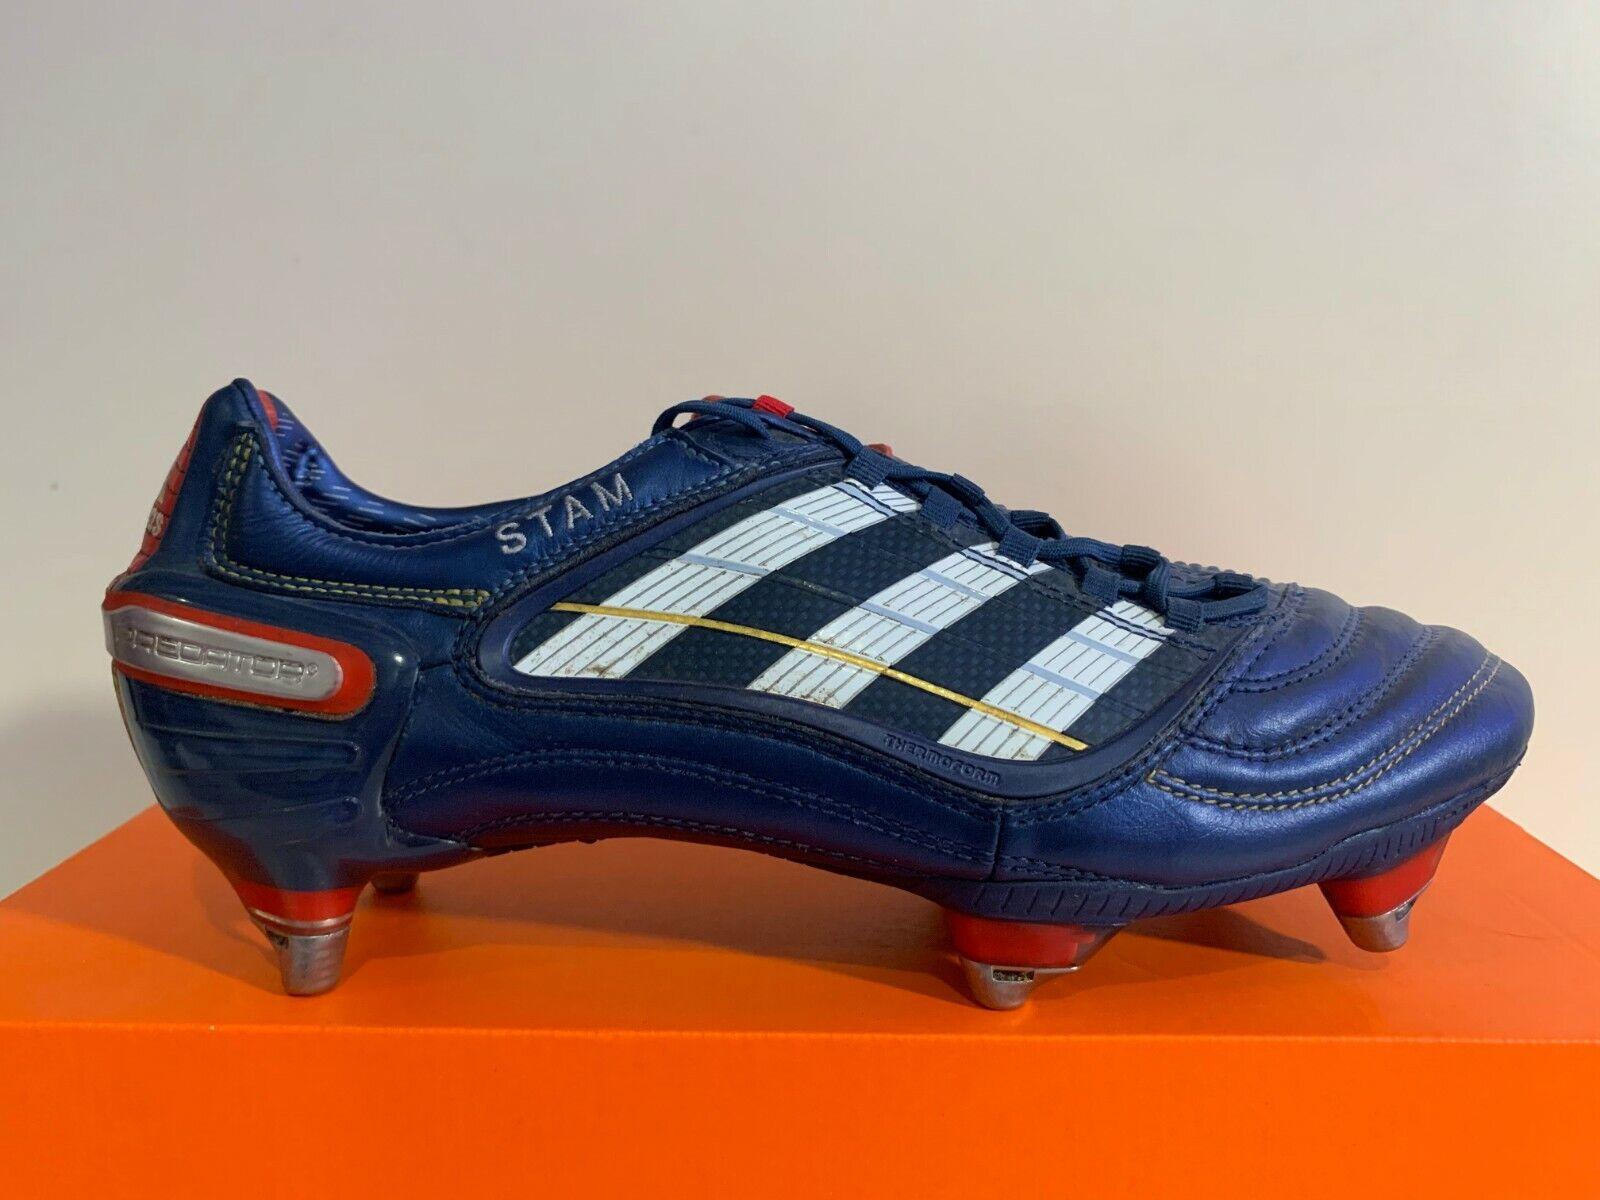 Adidas Protator Powerswerve Champions league Größe 7,5 8 41